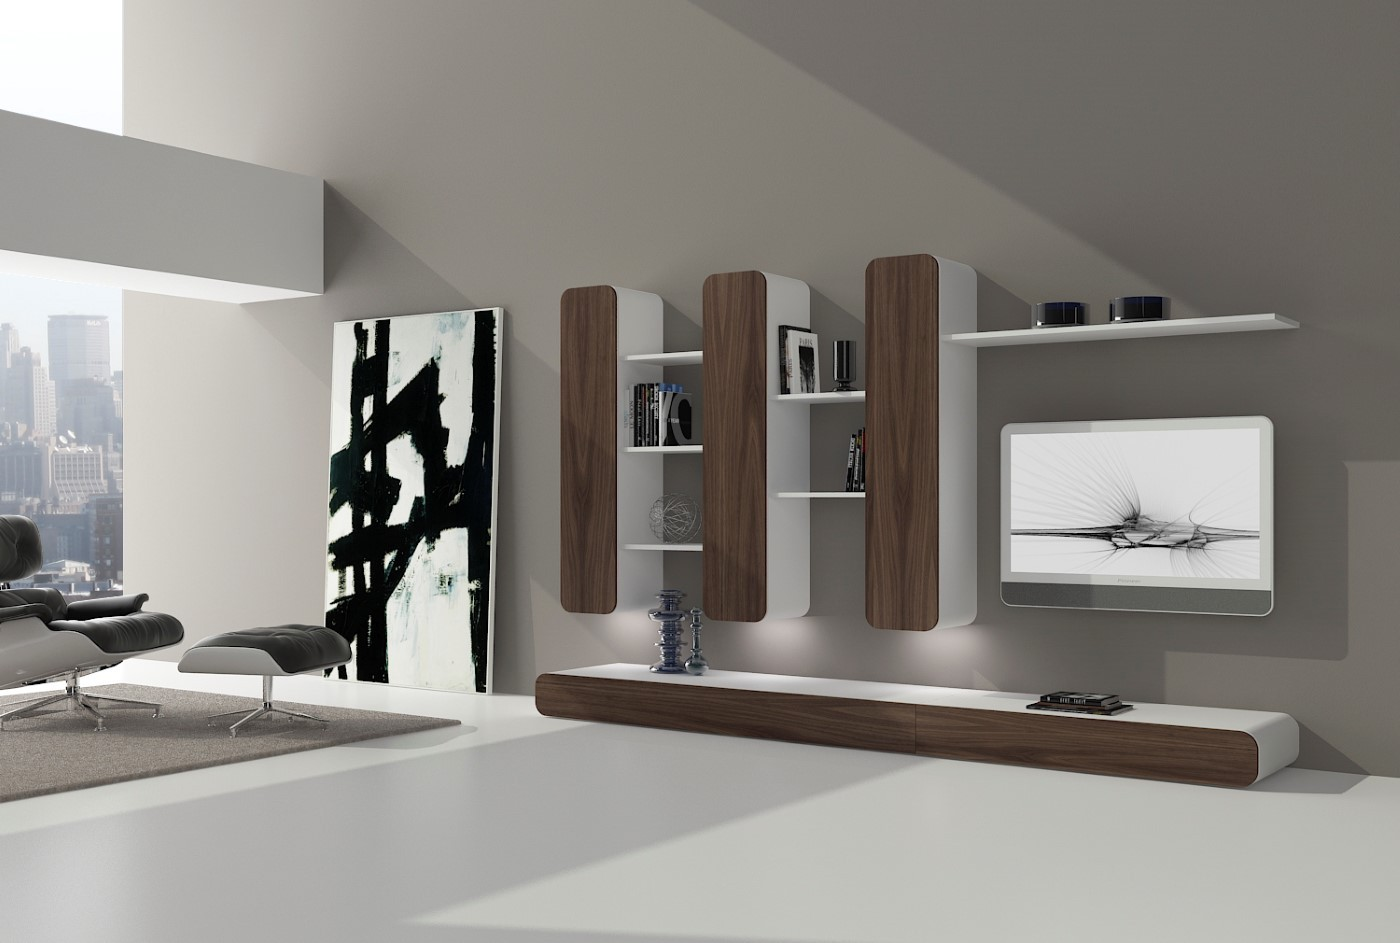 Salones modernos de calidad online en valencia for Librerias para salones modernos